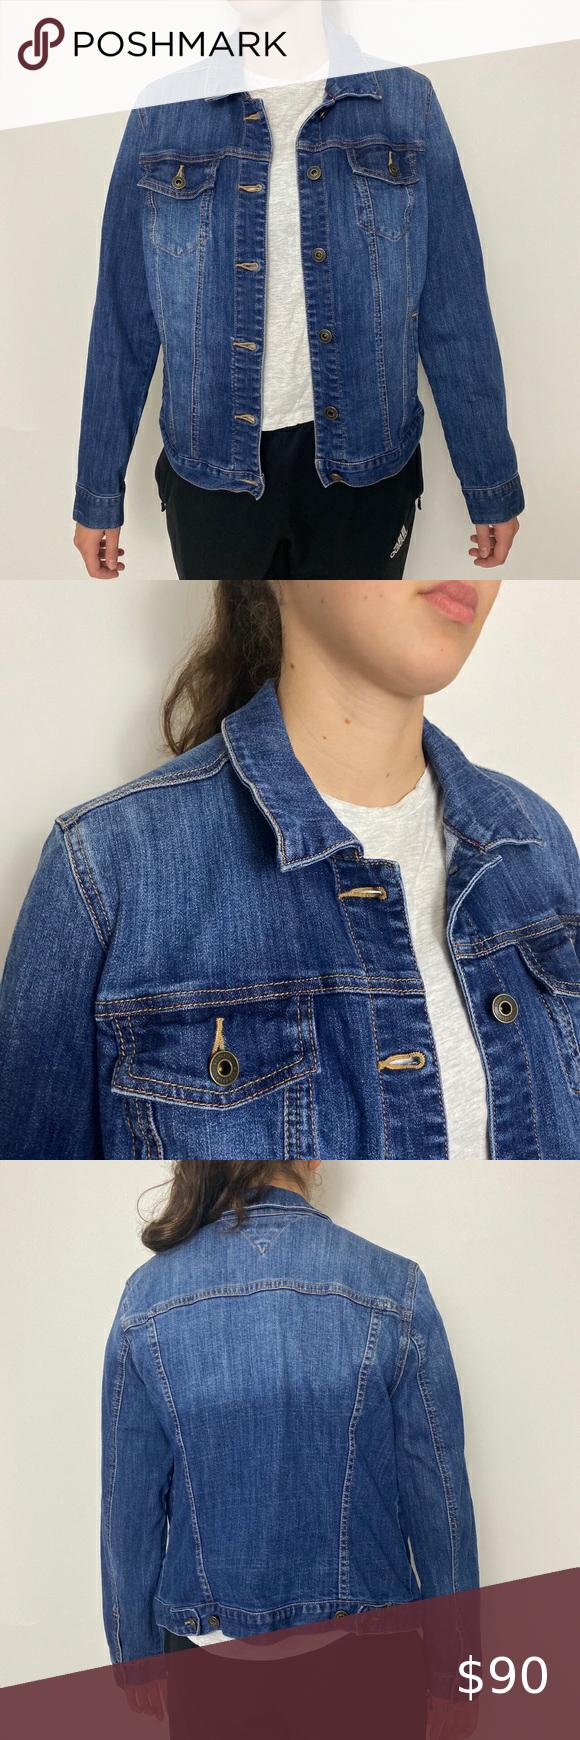 Women S Tommy Hilfiger Denim Jacket Size Large Hilfiger Denim Clothes Design Denim Jacket [ 1740 x 580 Pixel ]